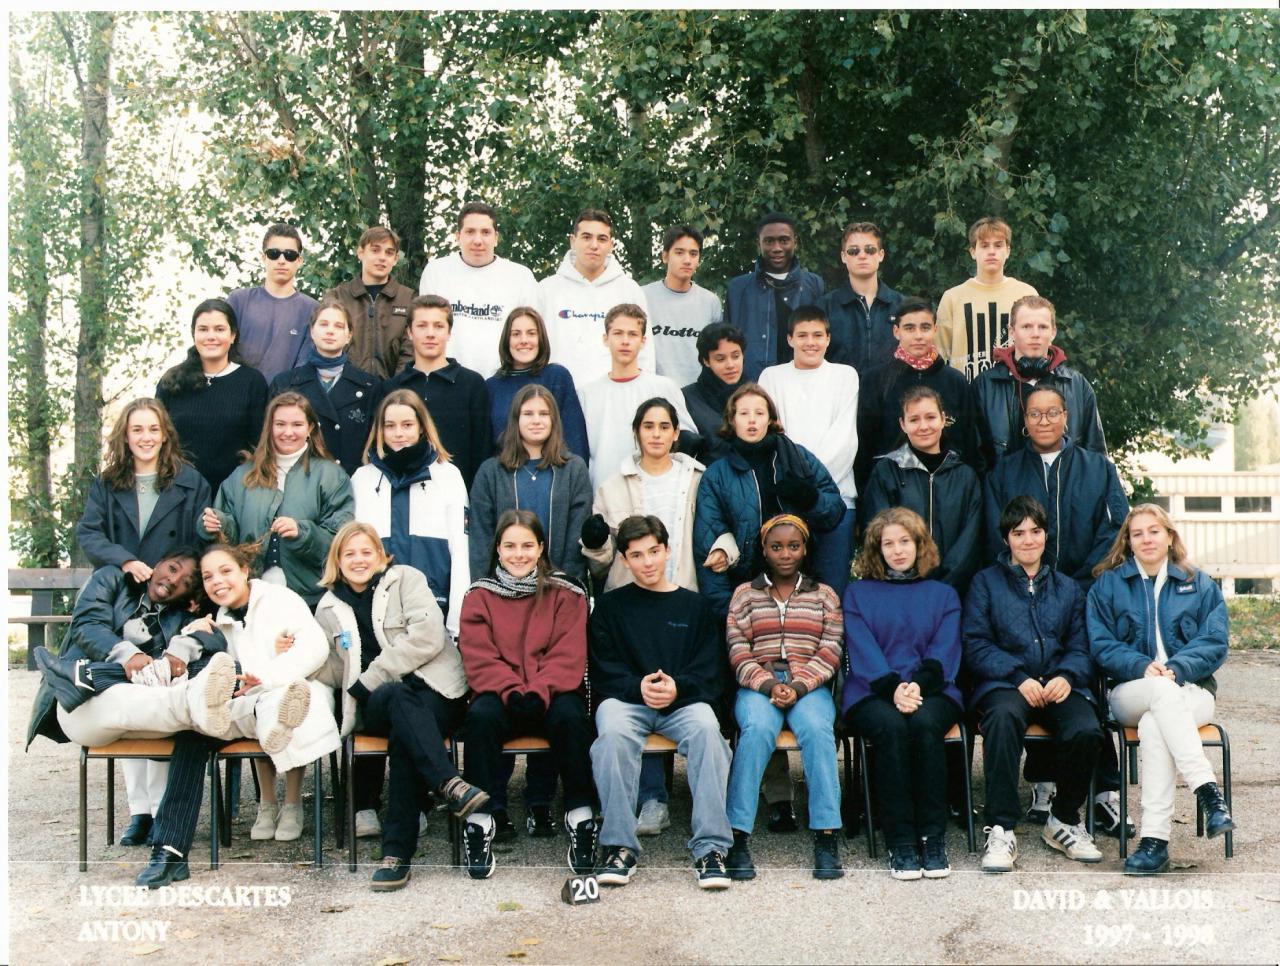 1998 - 2.8 - DAVID